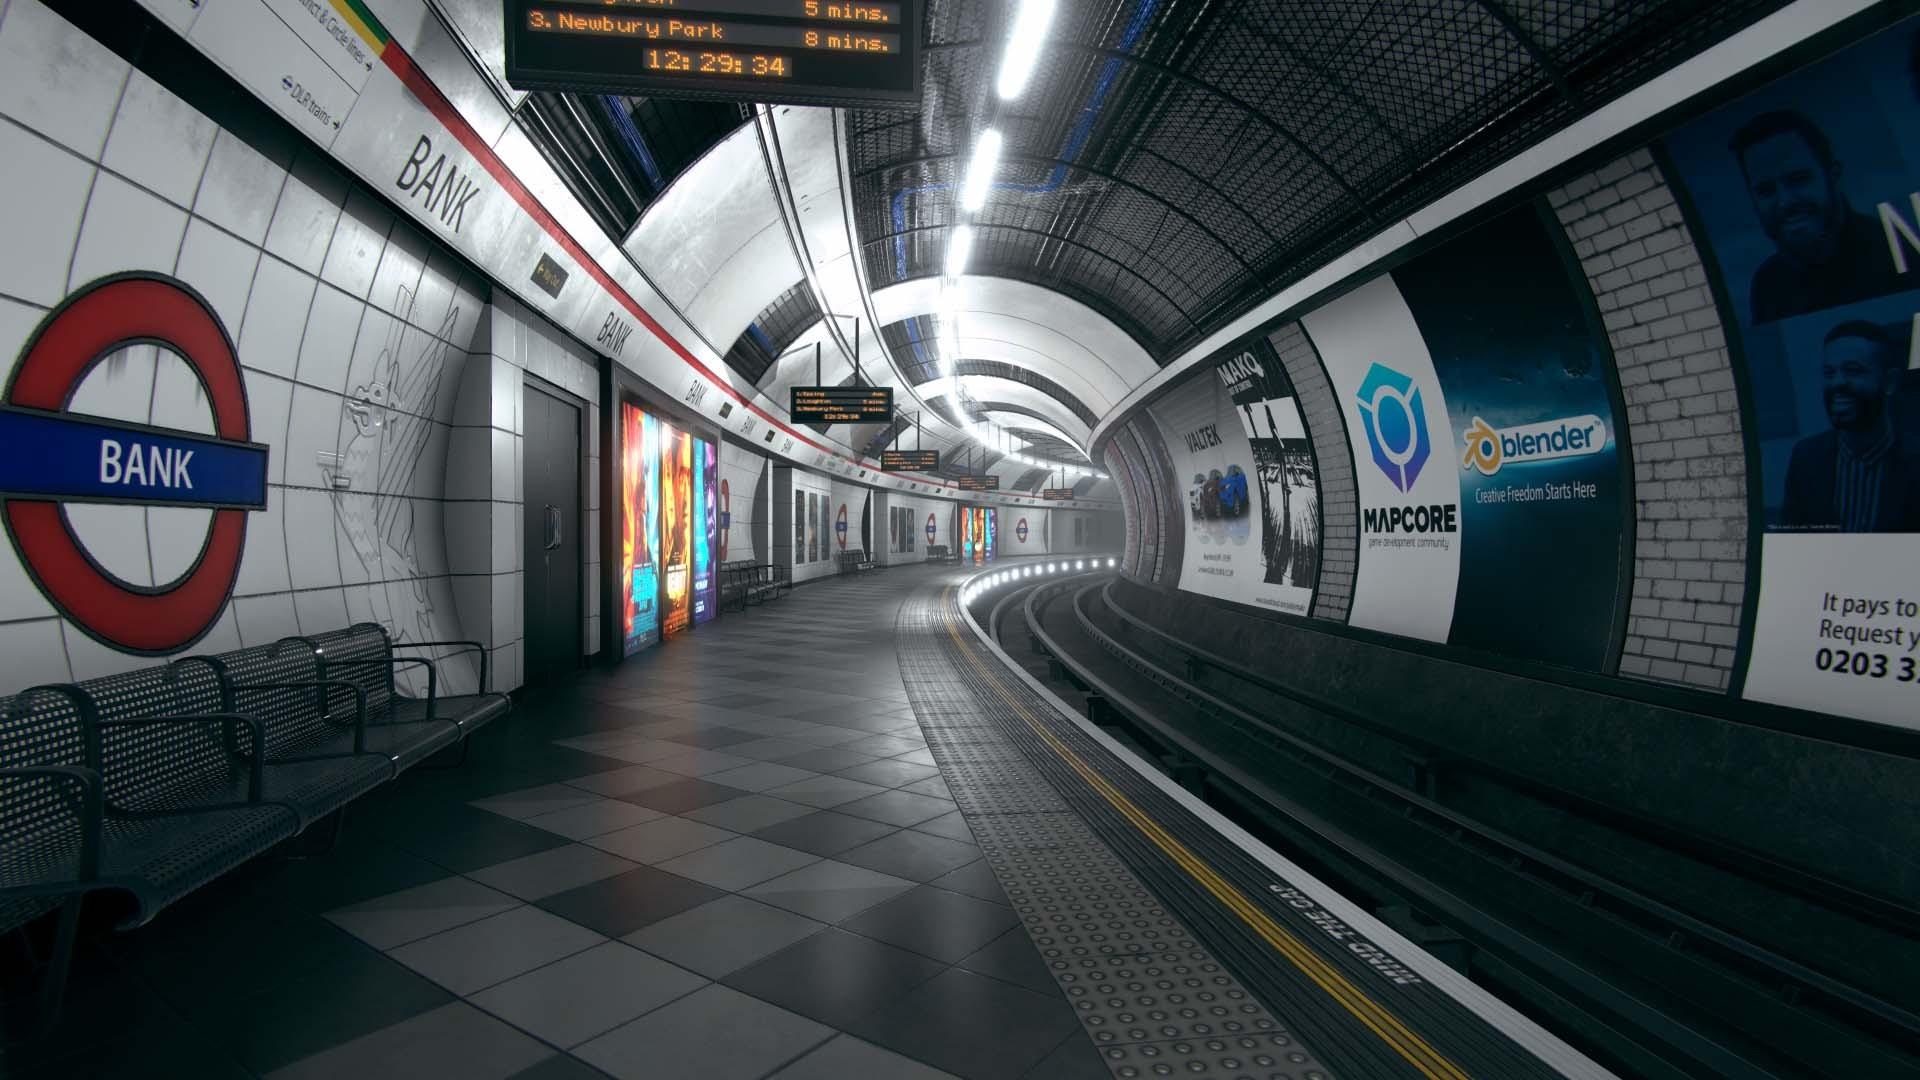 station.jpg.0eebde705de9834eb86bb80087134268.jpg